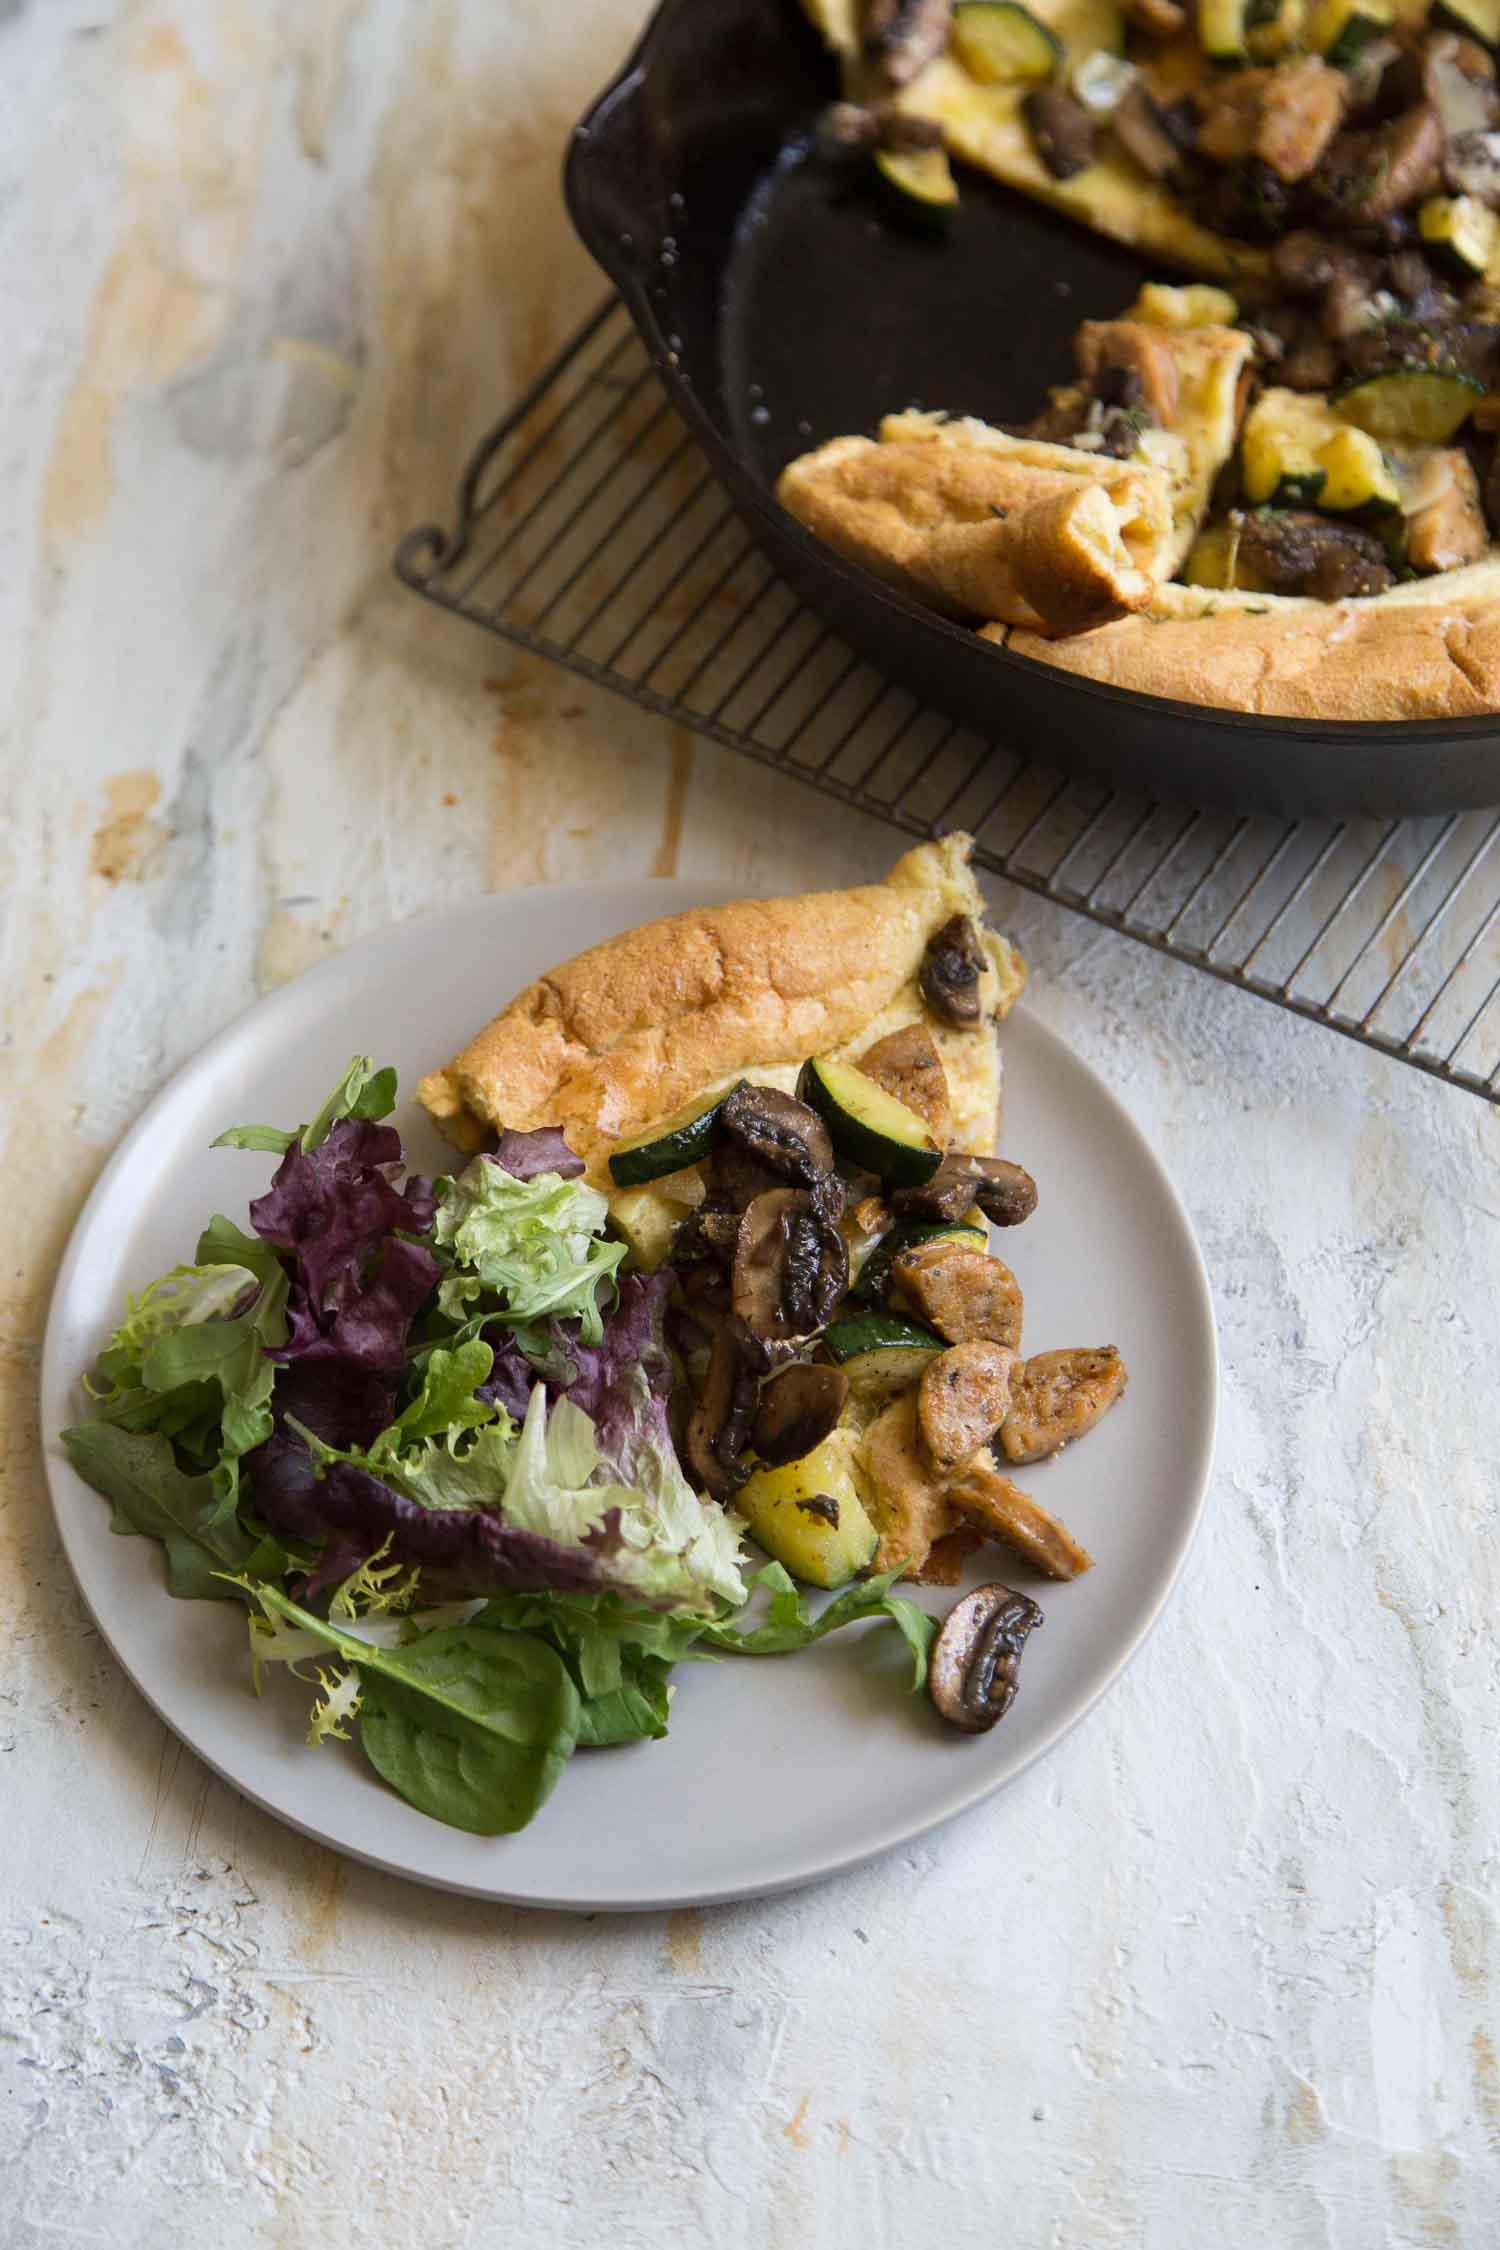 Savory Dutch Baby Pancake with veggies and sausage